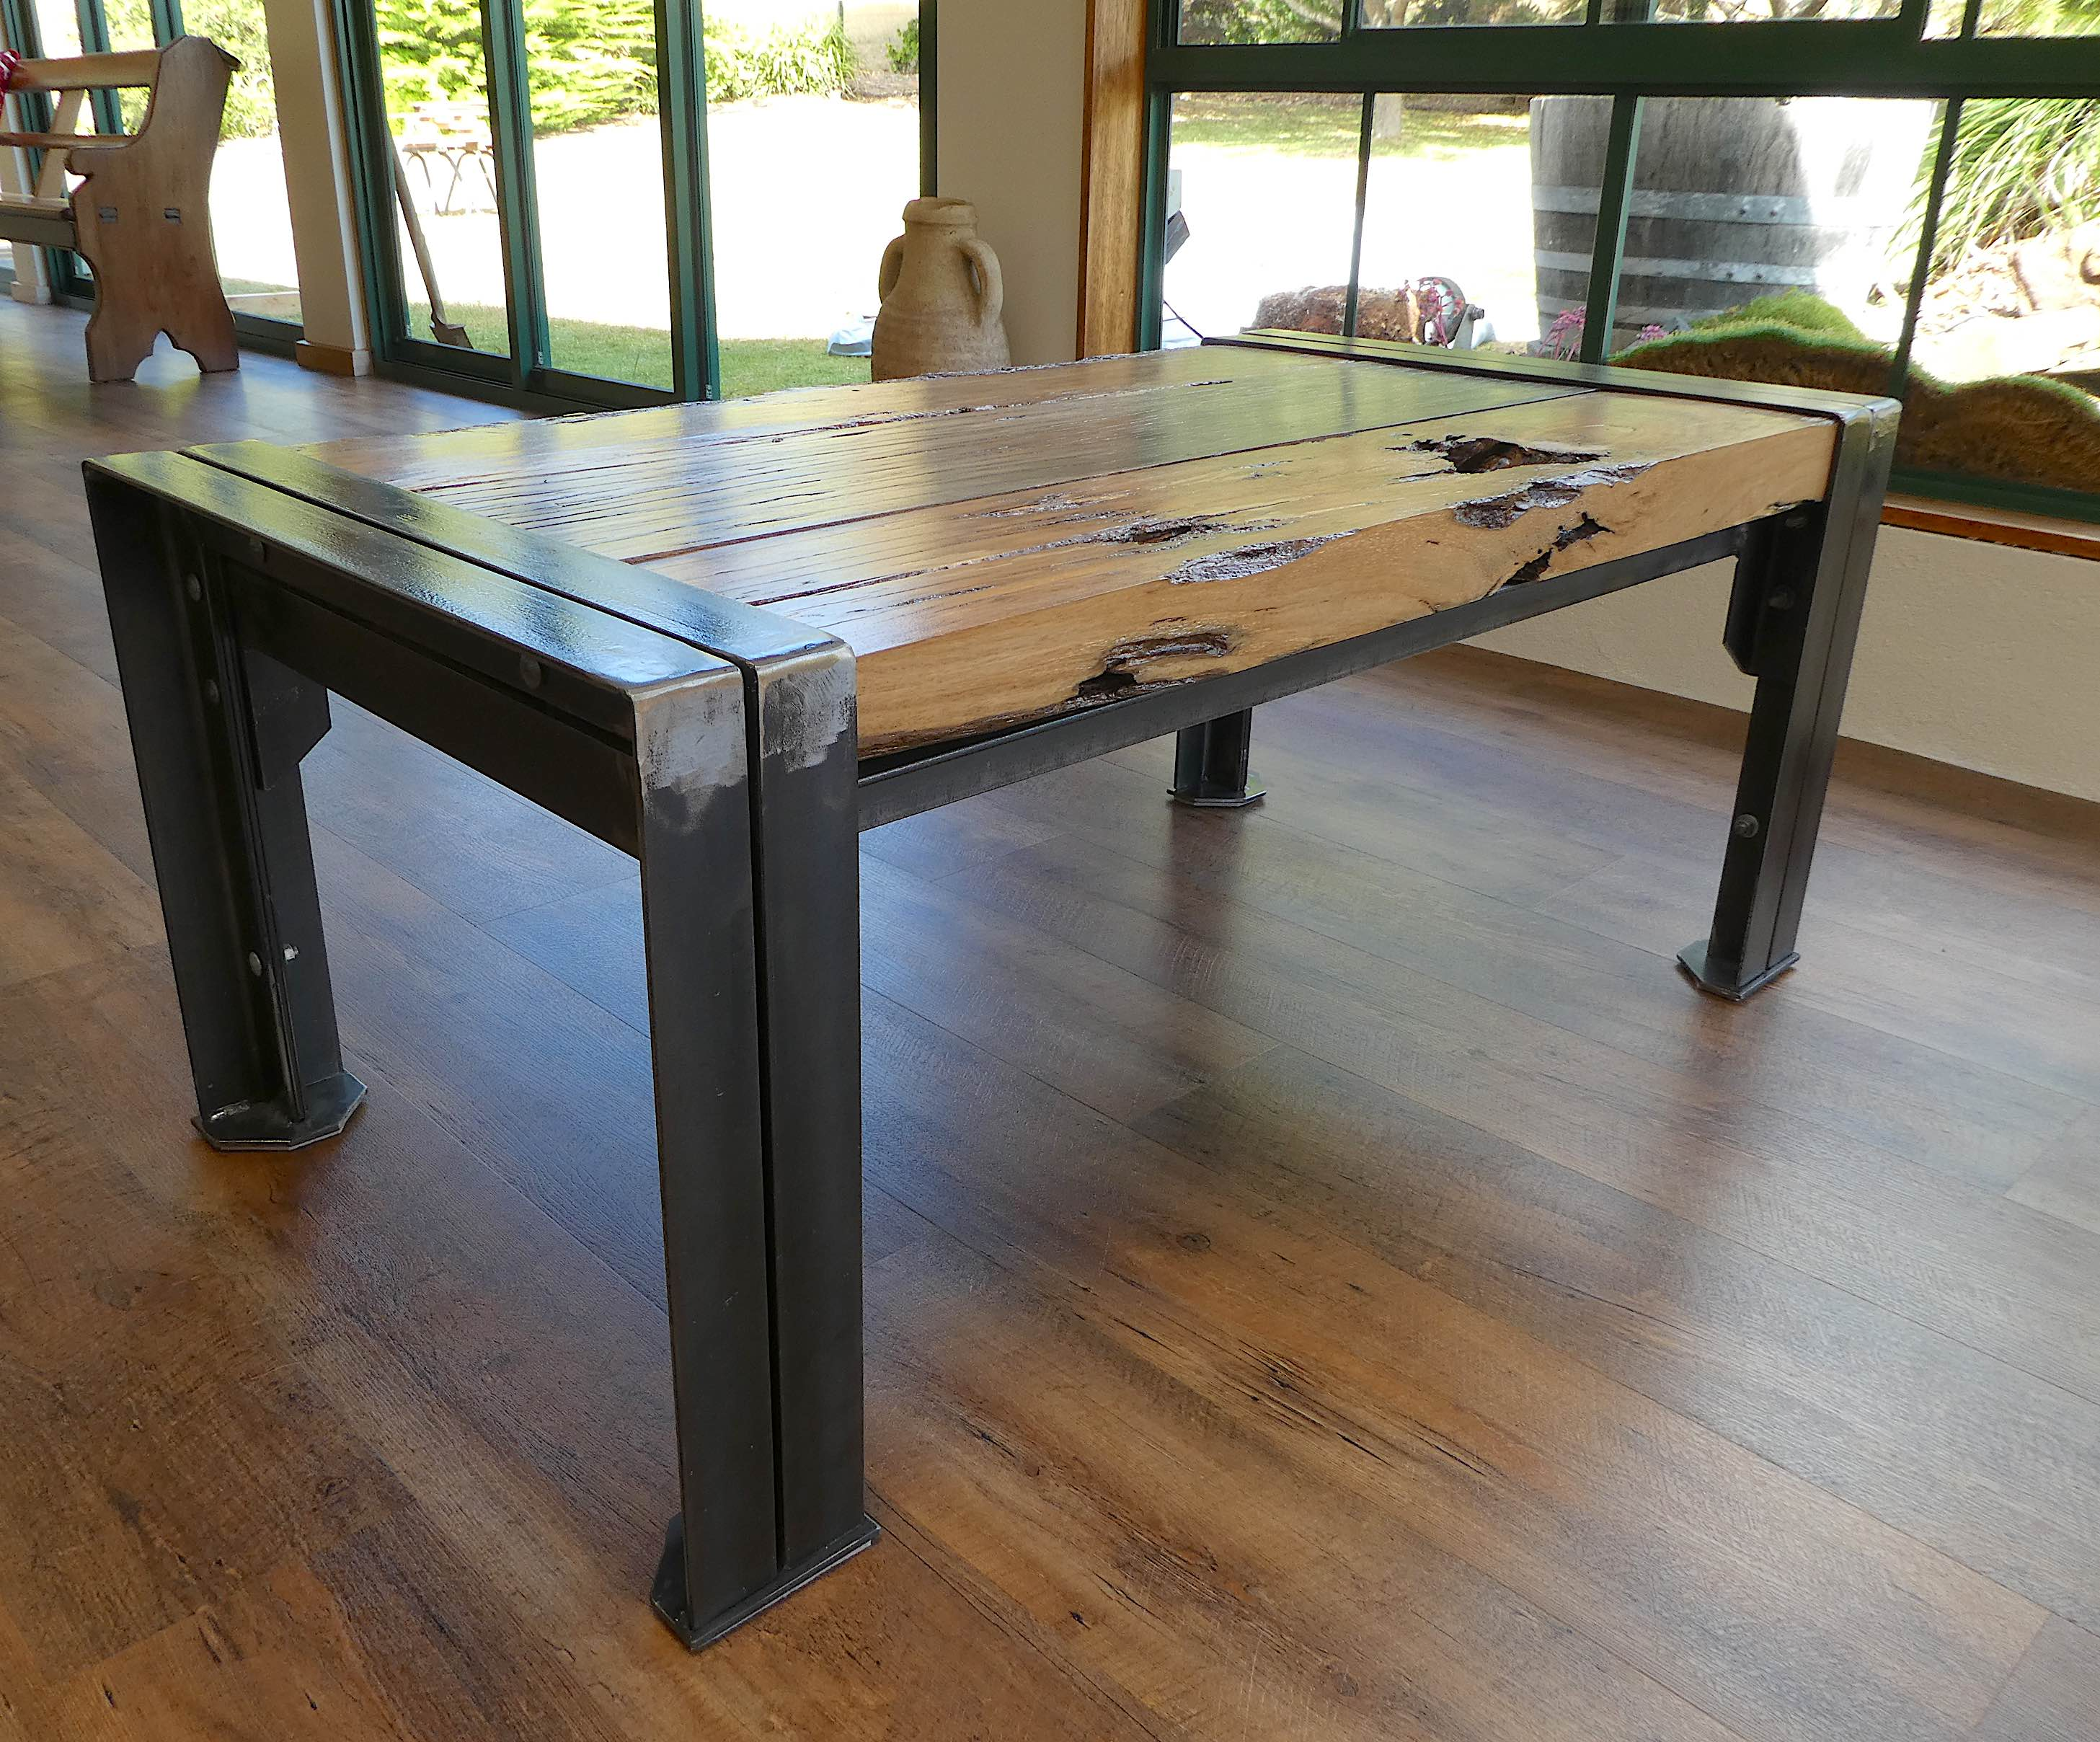 32.mini me coffee table